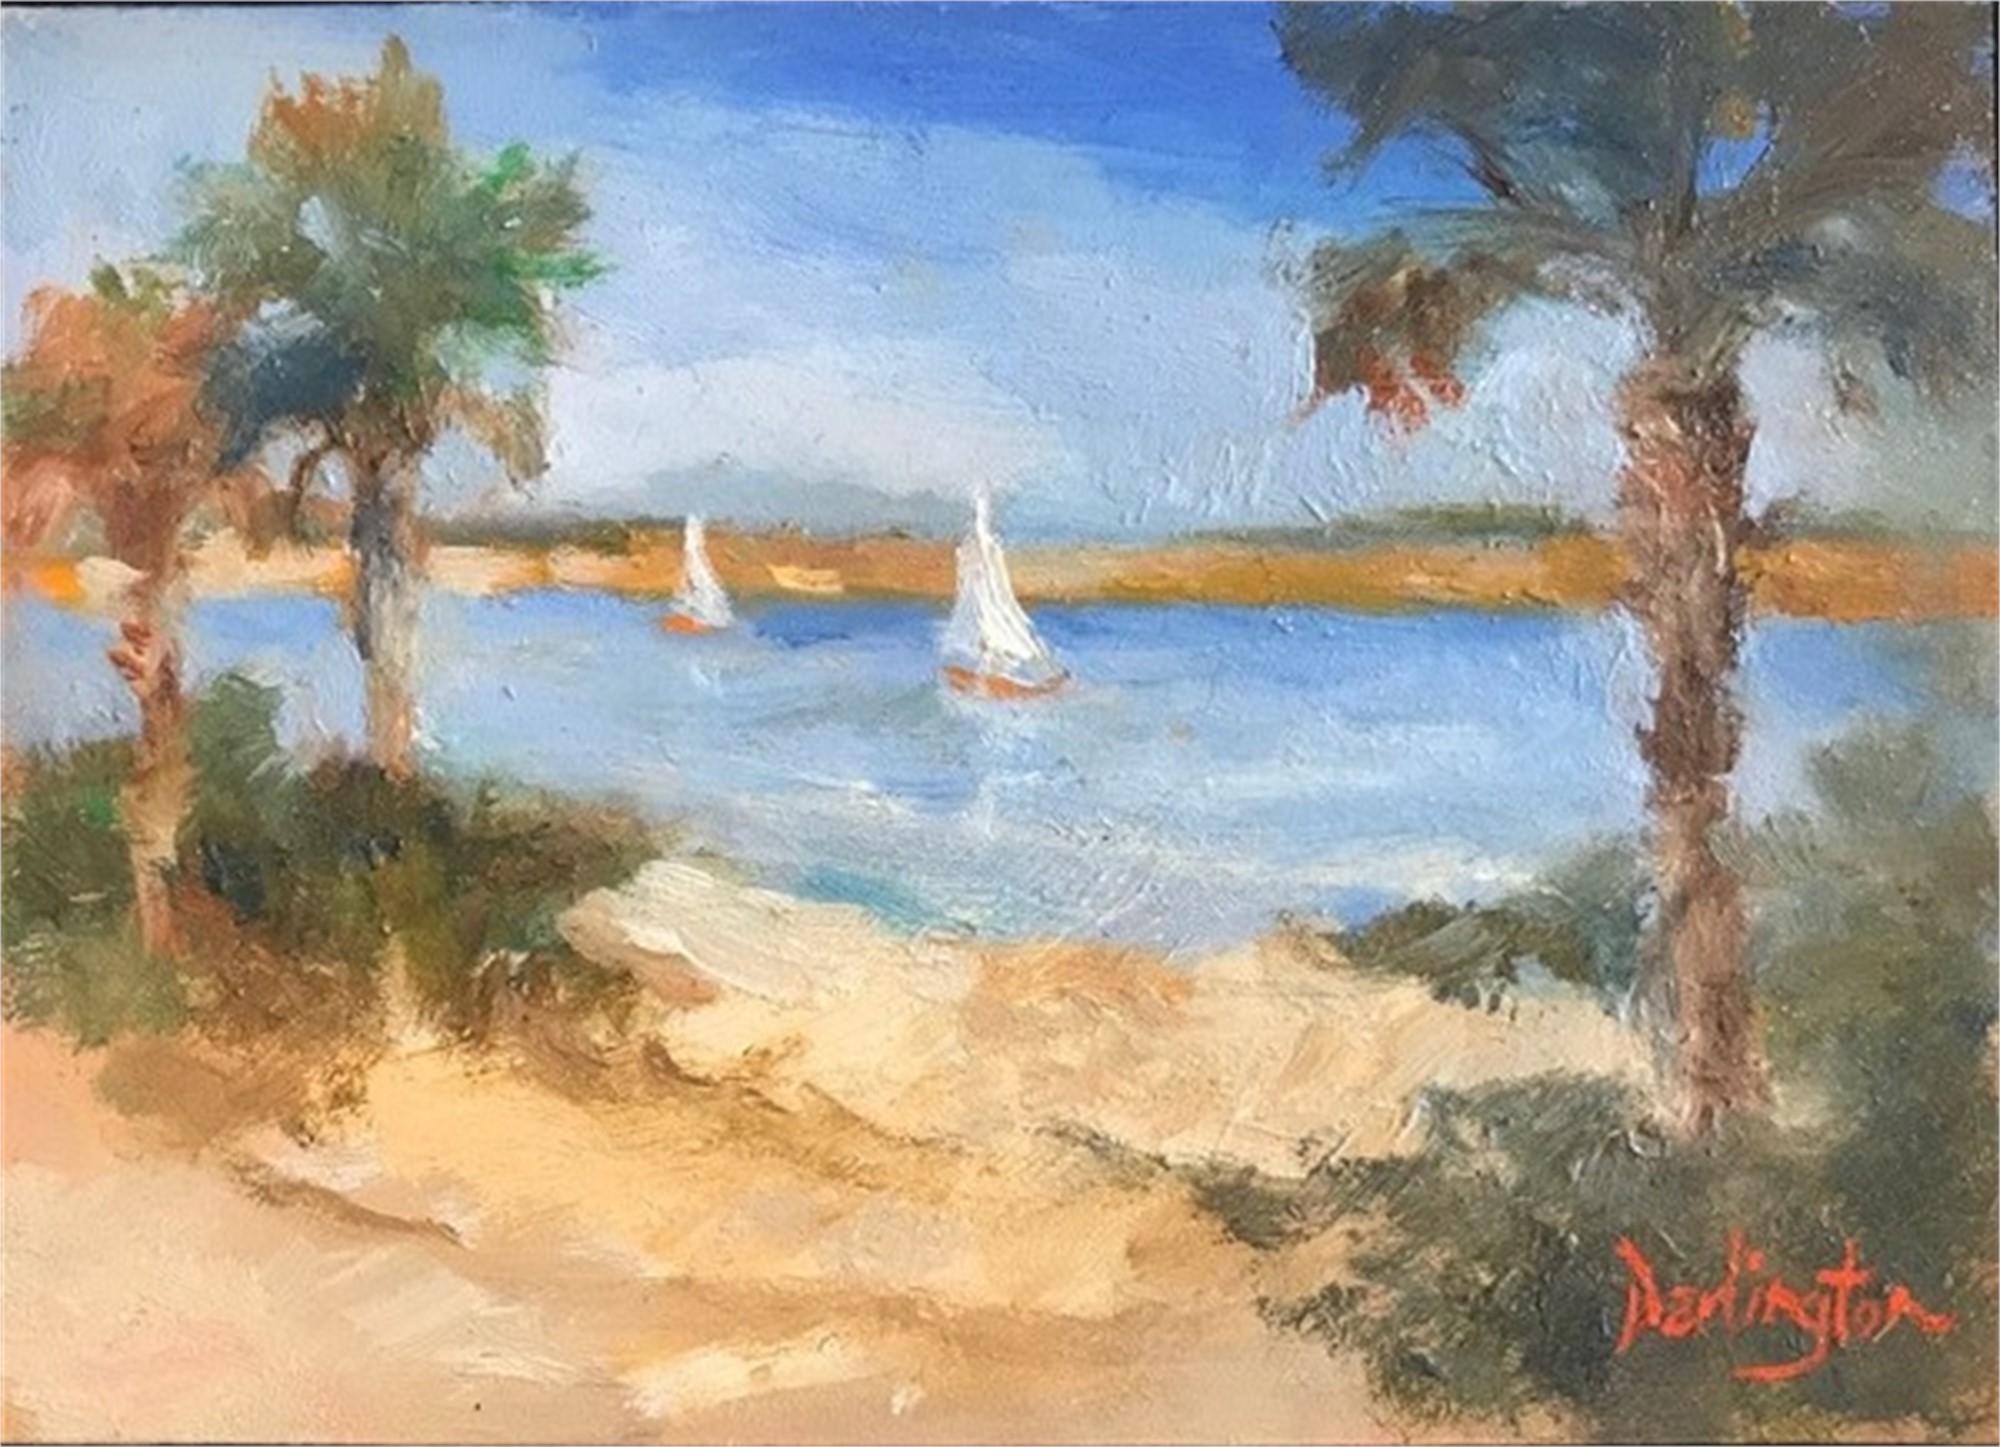 Sailboats on Waterway by Jim Darlington